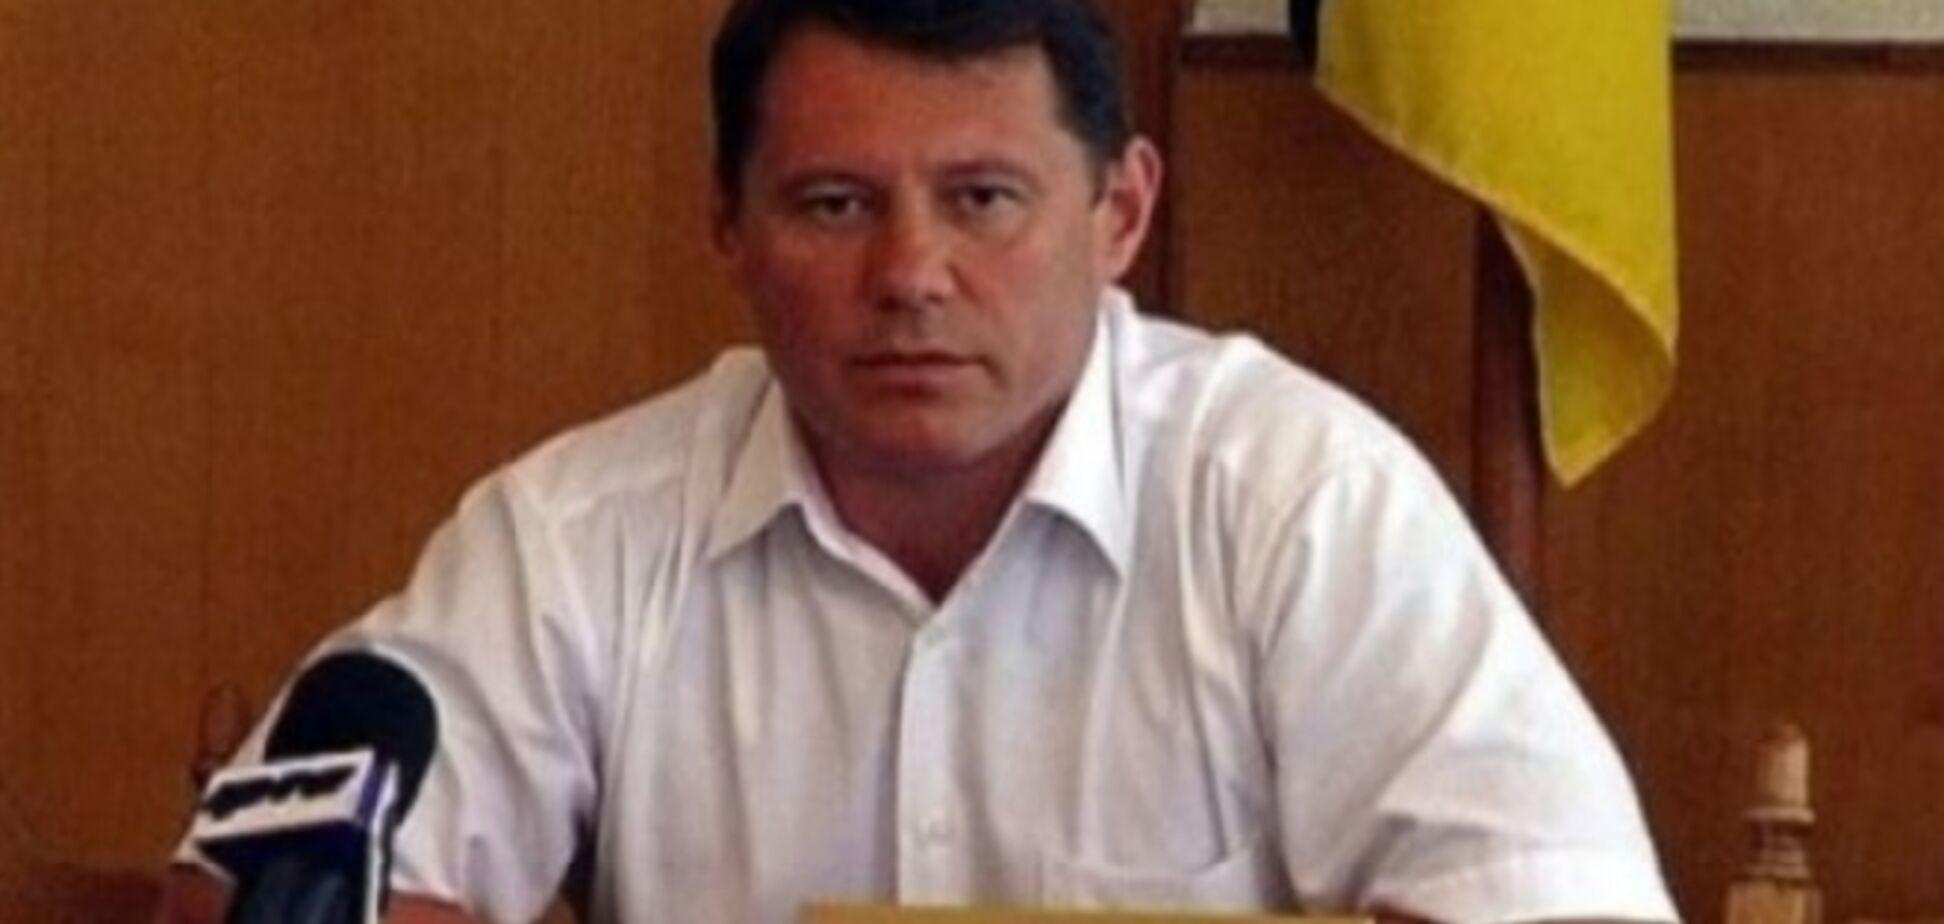 Мэра Стаханова облили зеленкой, он госпитализирован